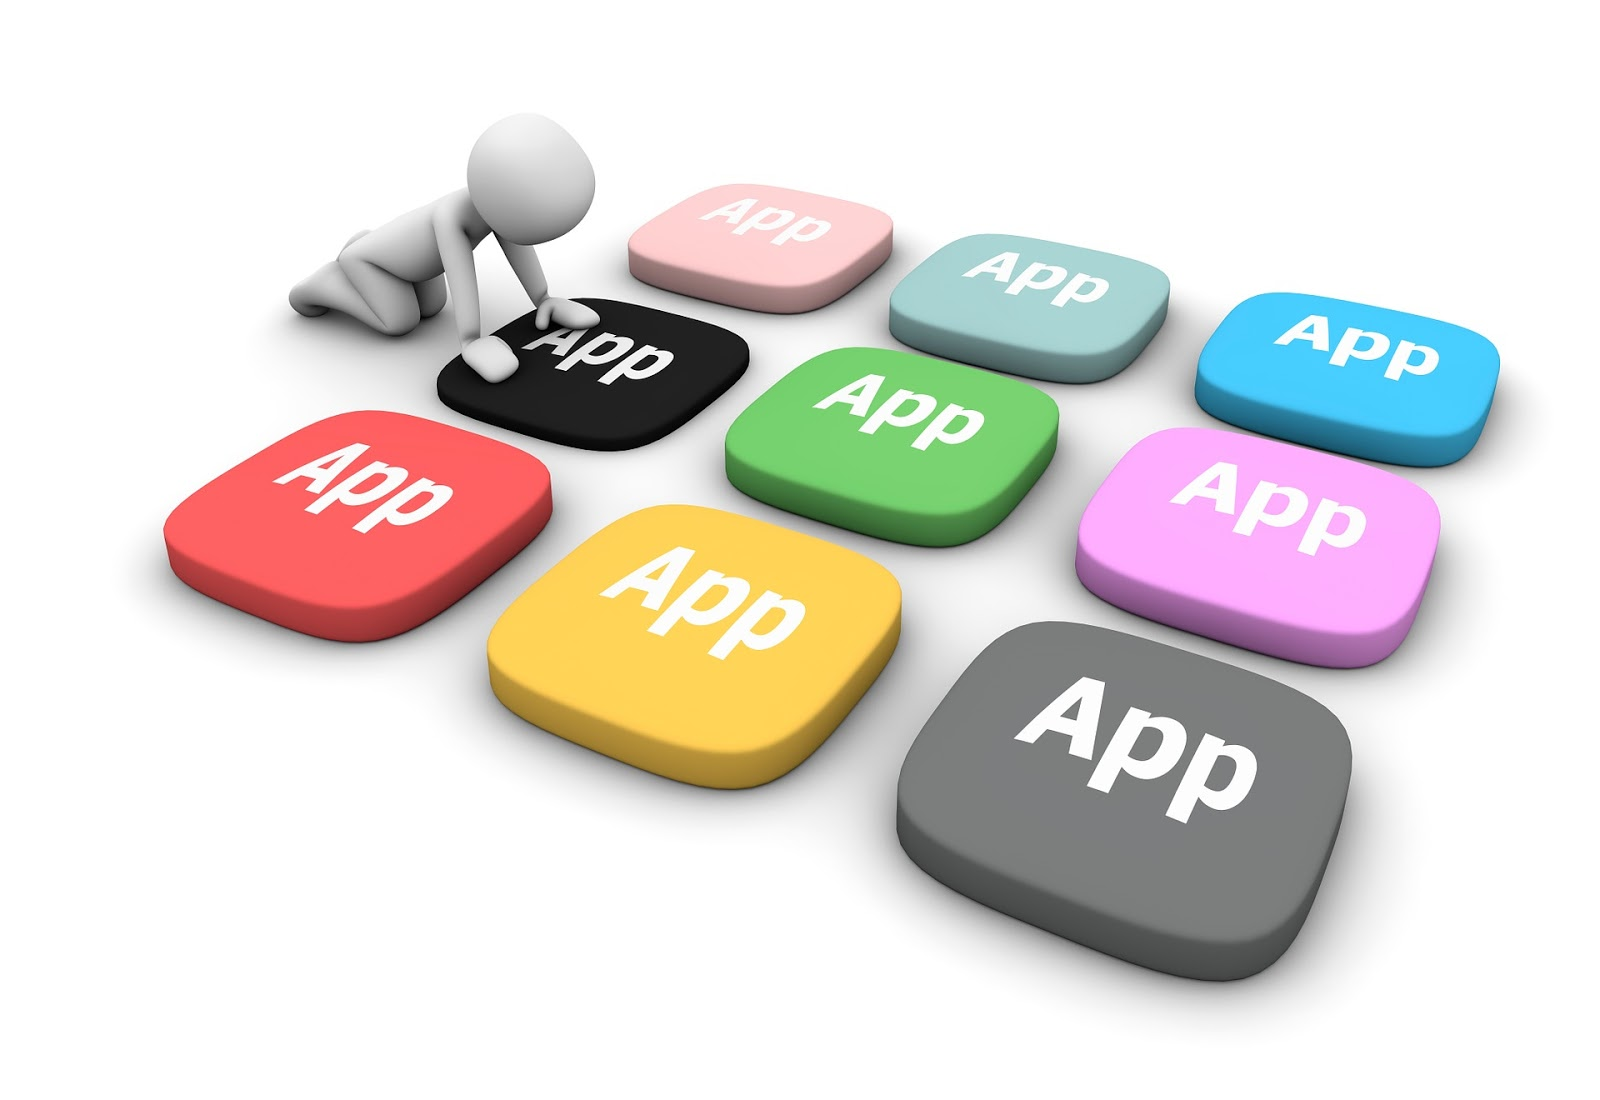 39d66-app-1013616_1920